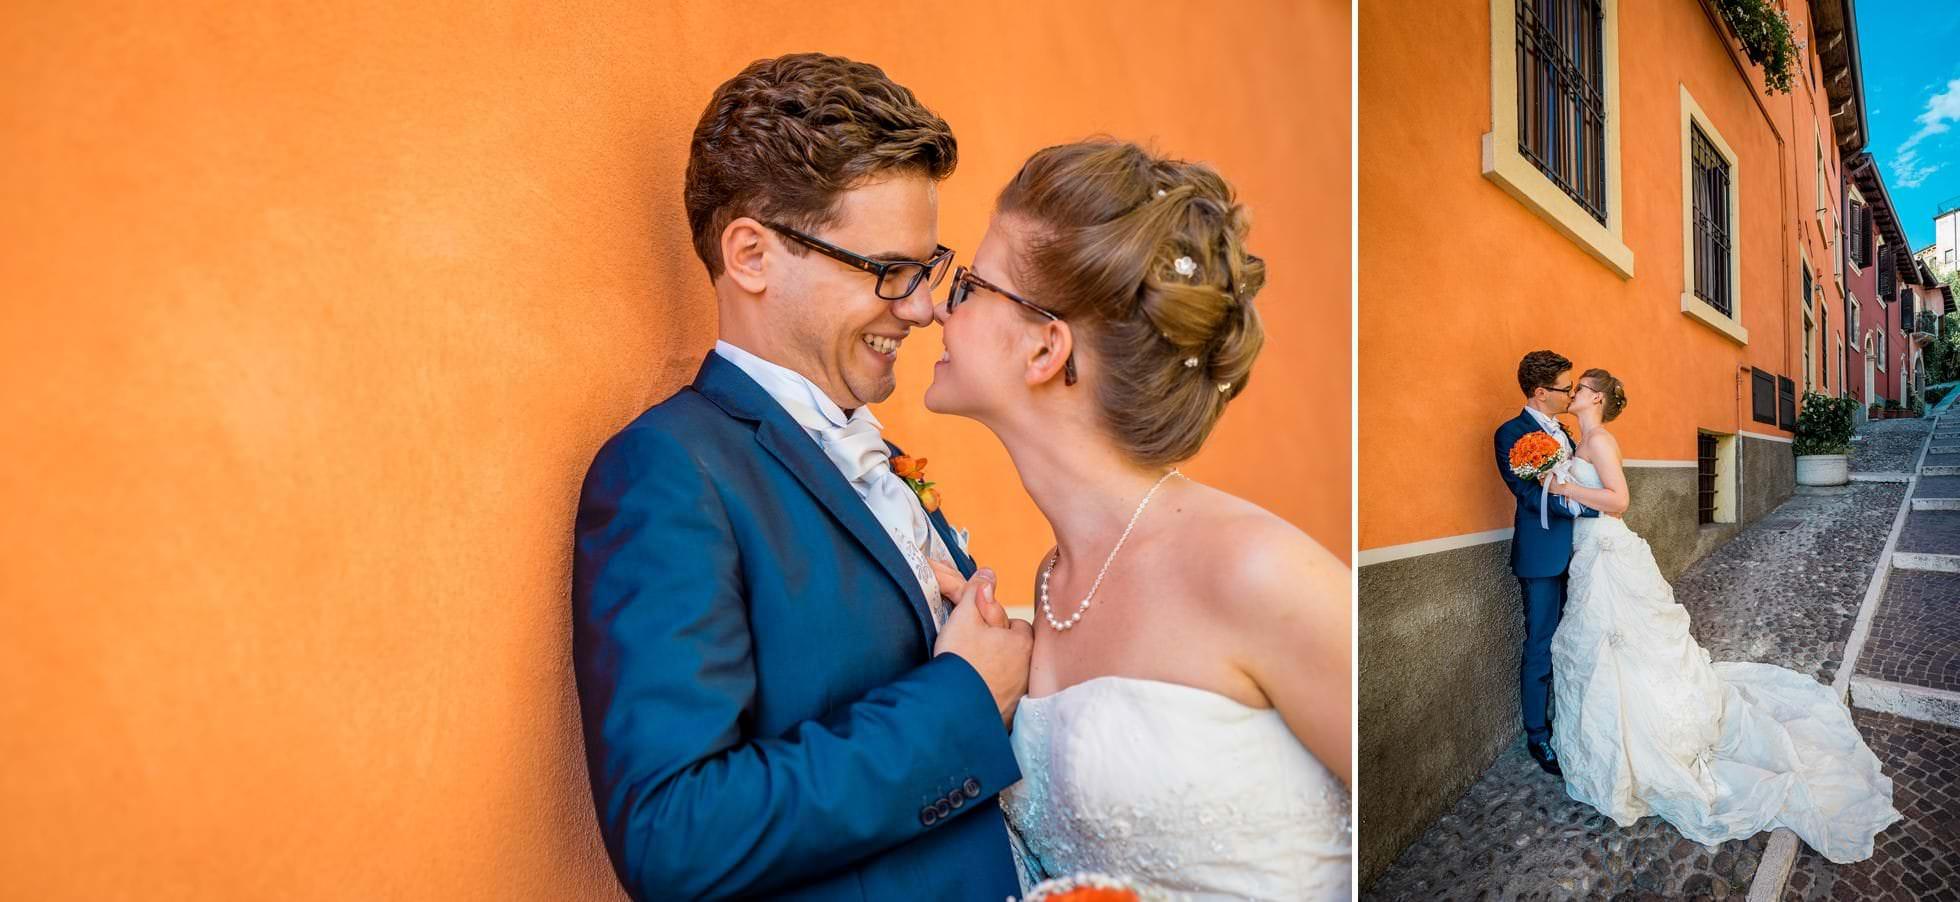 Fotografo matrimonio verona colori